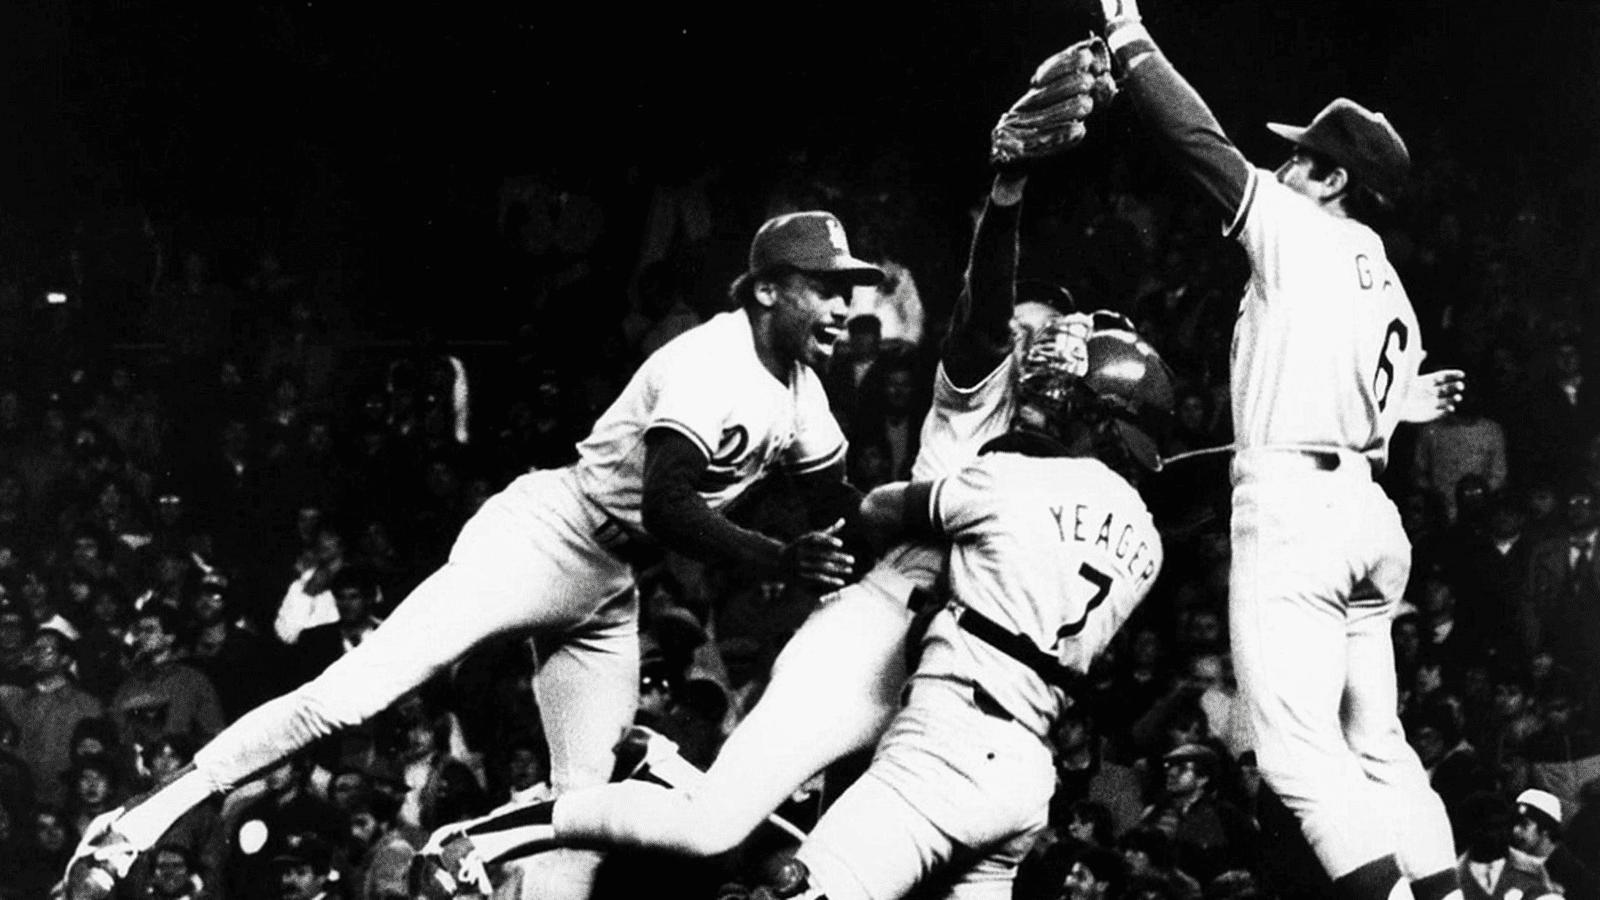 Dodgers 1981 World Series